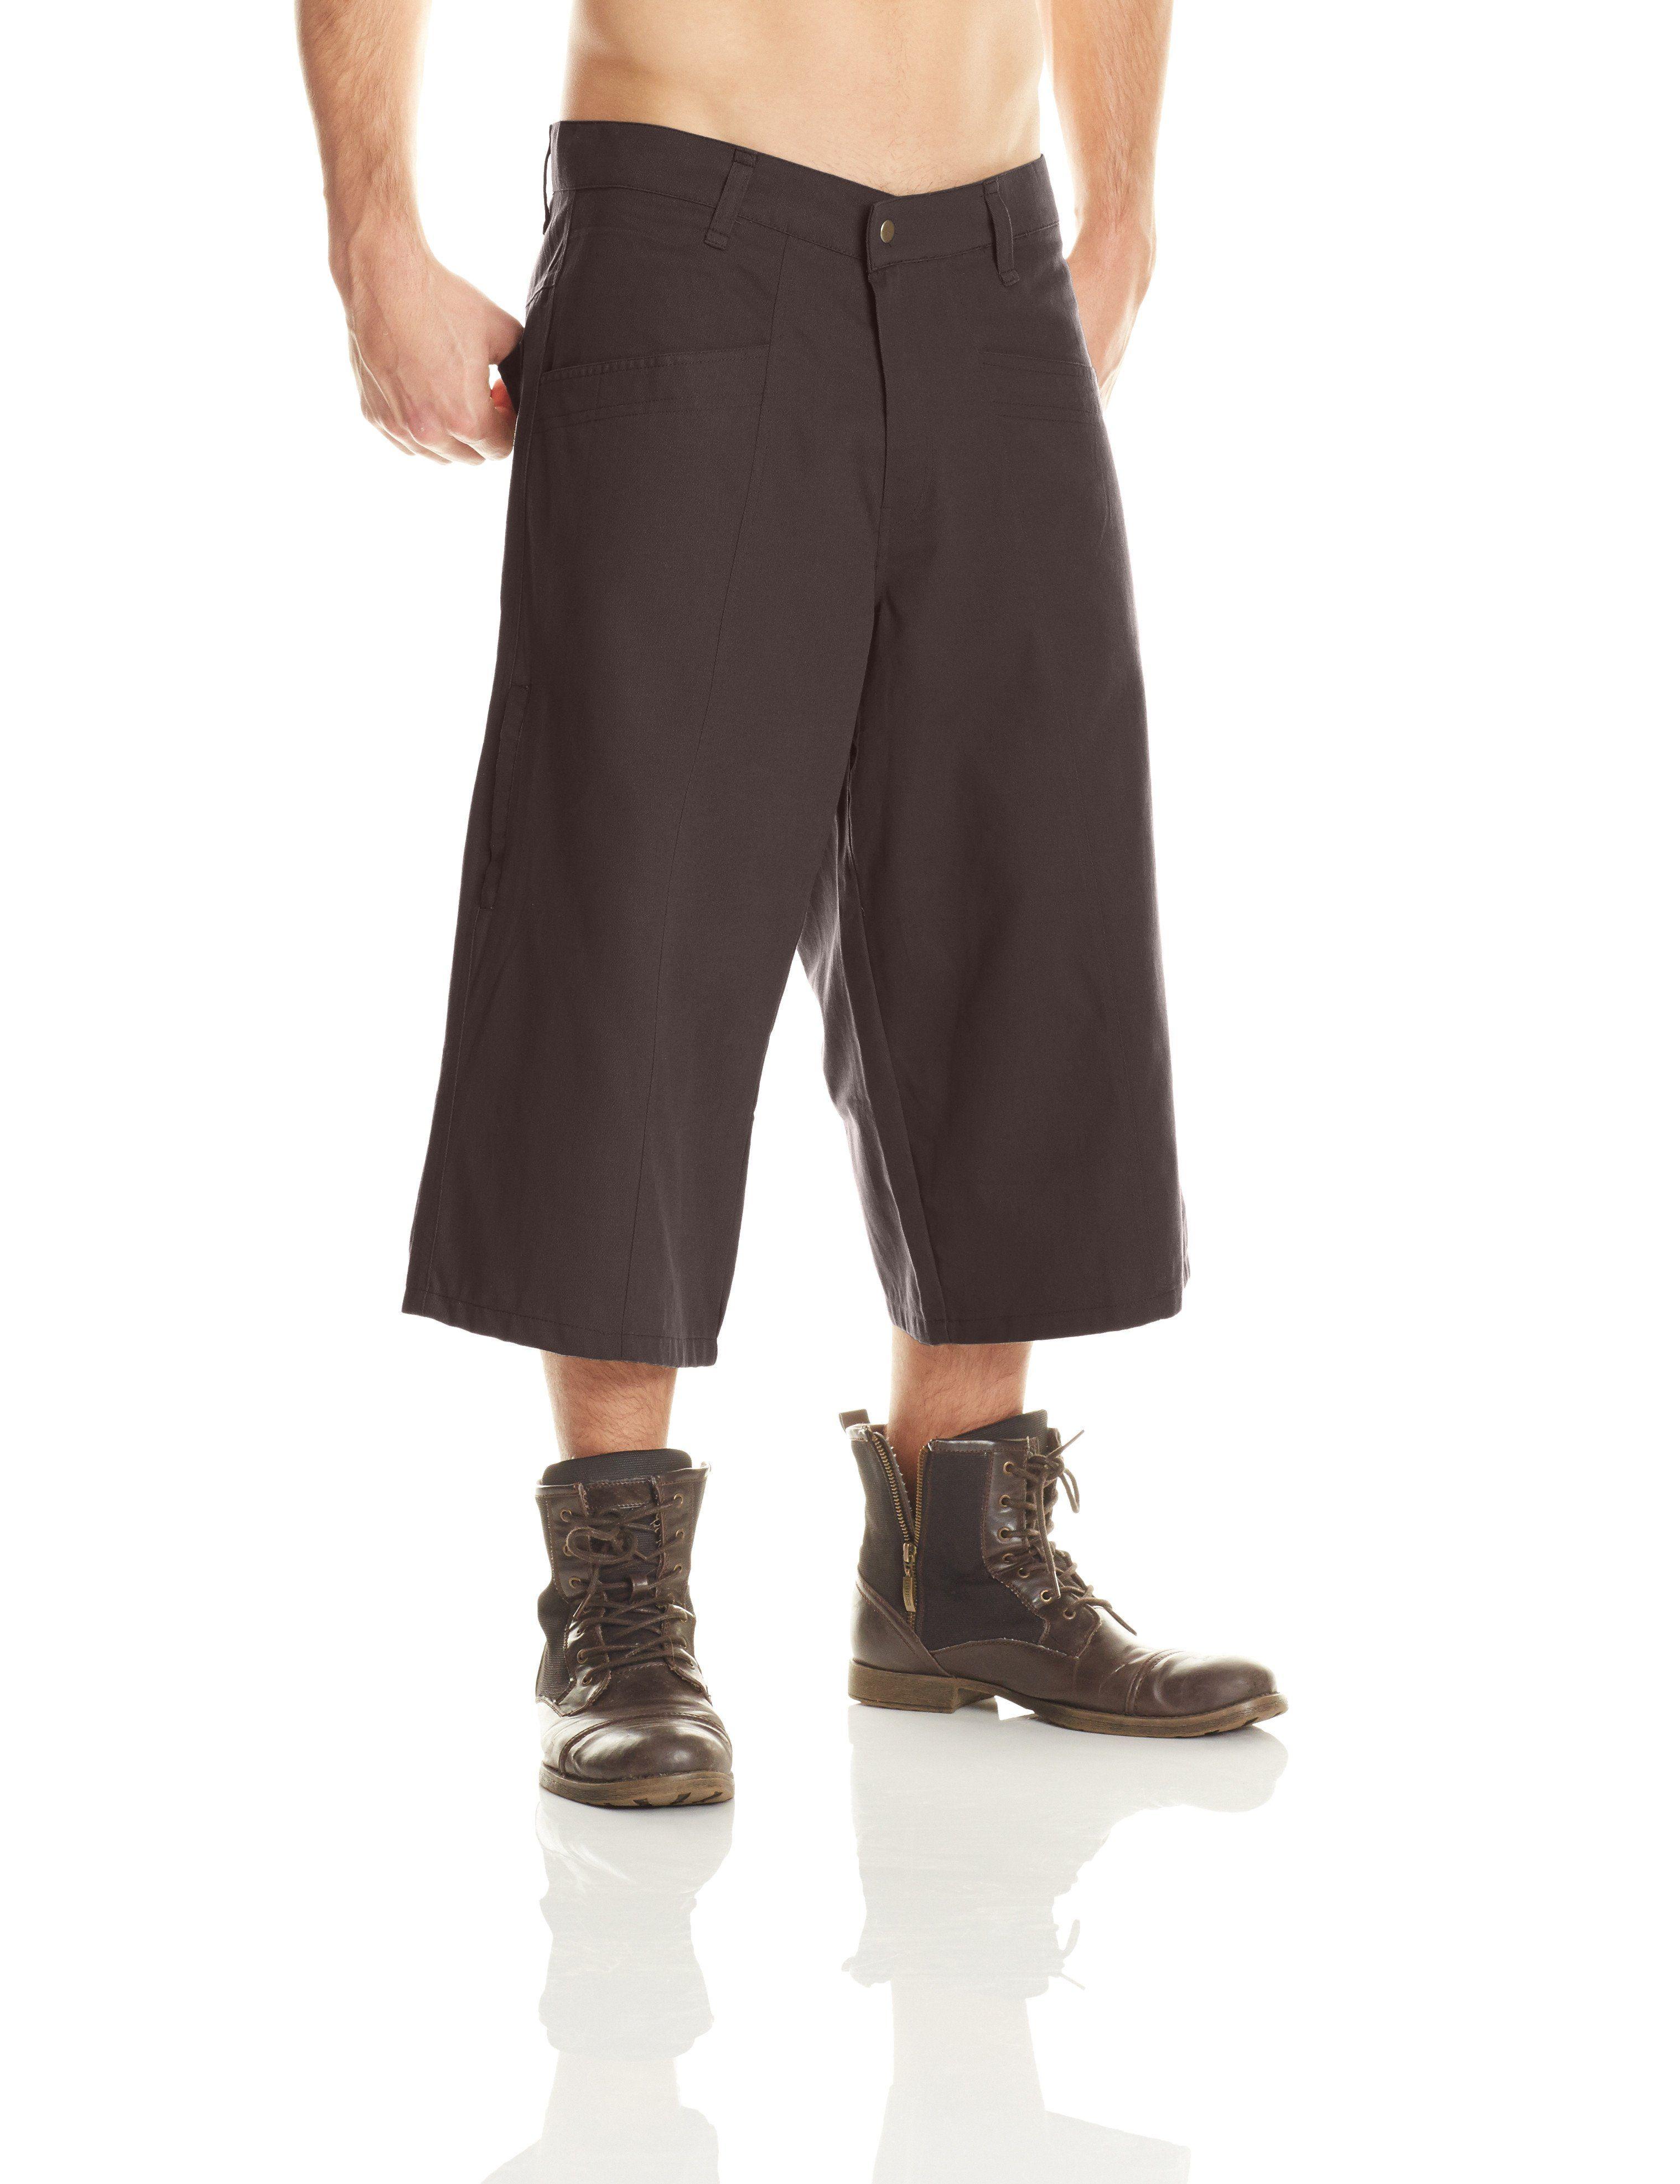 Brandit Urban Legend Shorts Bermuda Pantalon Cargo Hommes Olive s-7xl Fashion Outdoor